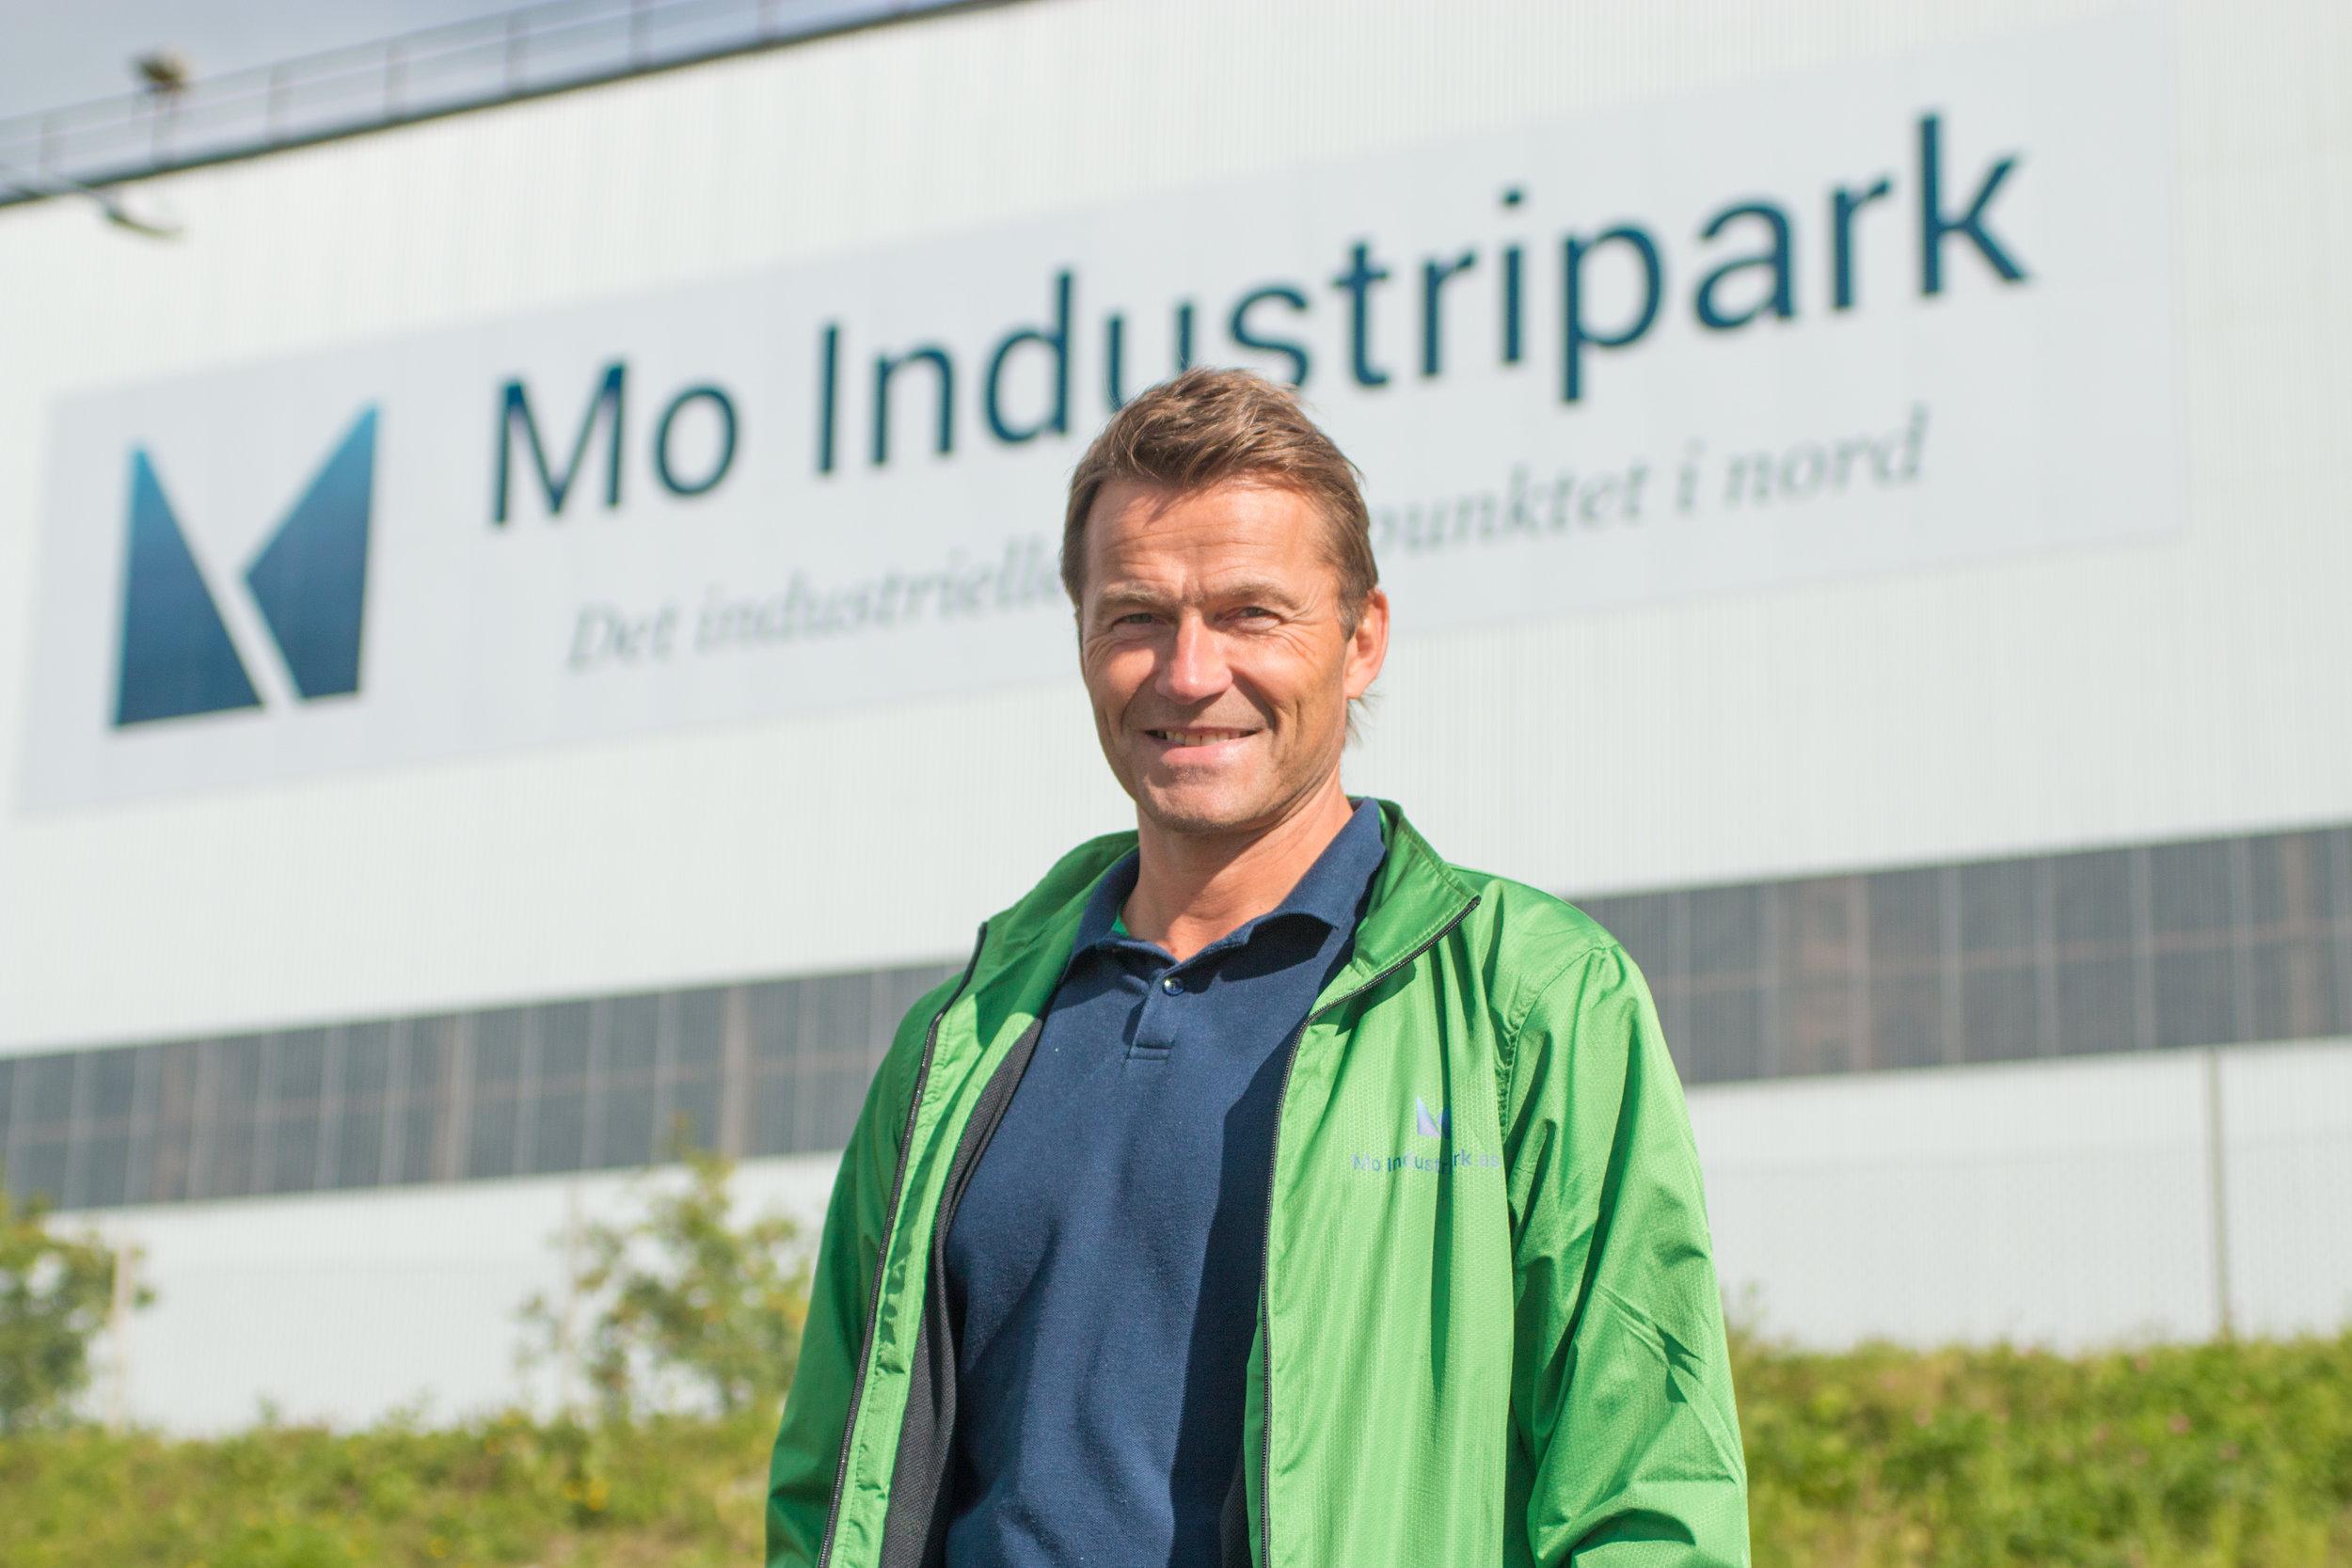 Fornyer samarbeidet med Rød snø. Markedssjef i Mo Industripark, Jan Gabor.